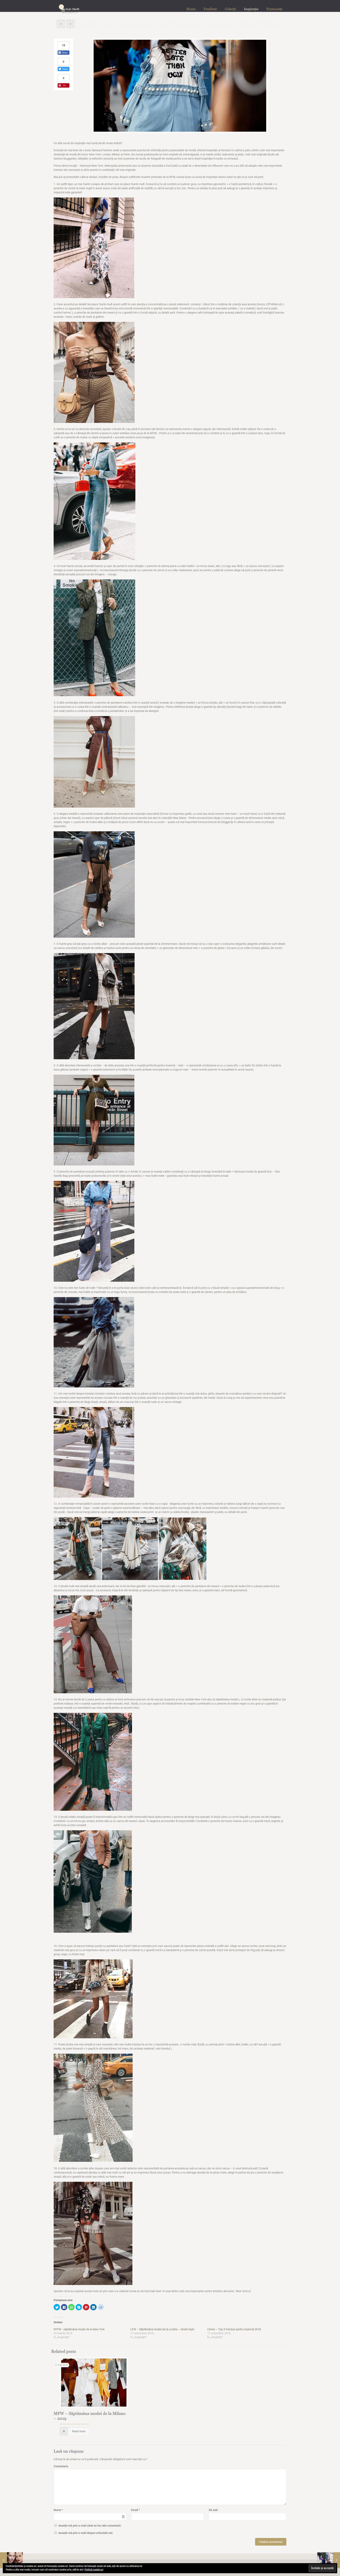 screencapture-thestylethrift-2018-10-17-nfw-saptamana-modei-de-la-new-york-street-style-2019-10-01-14_29_30